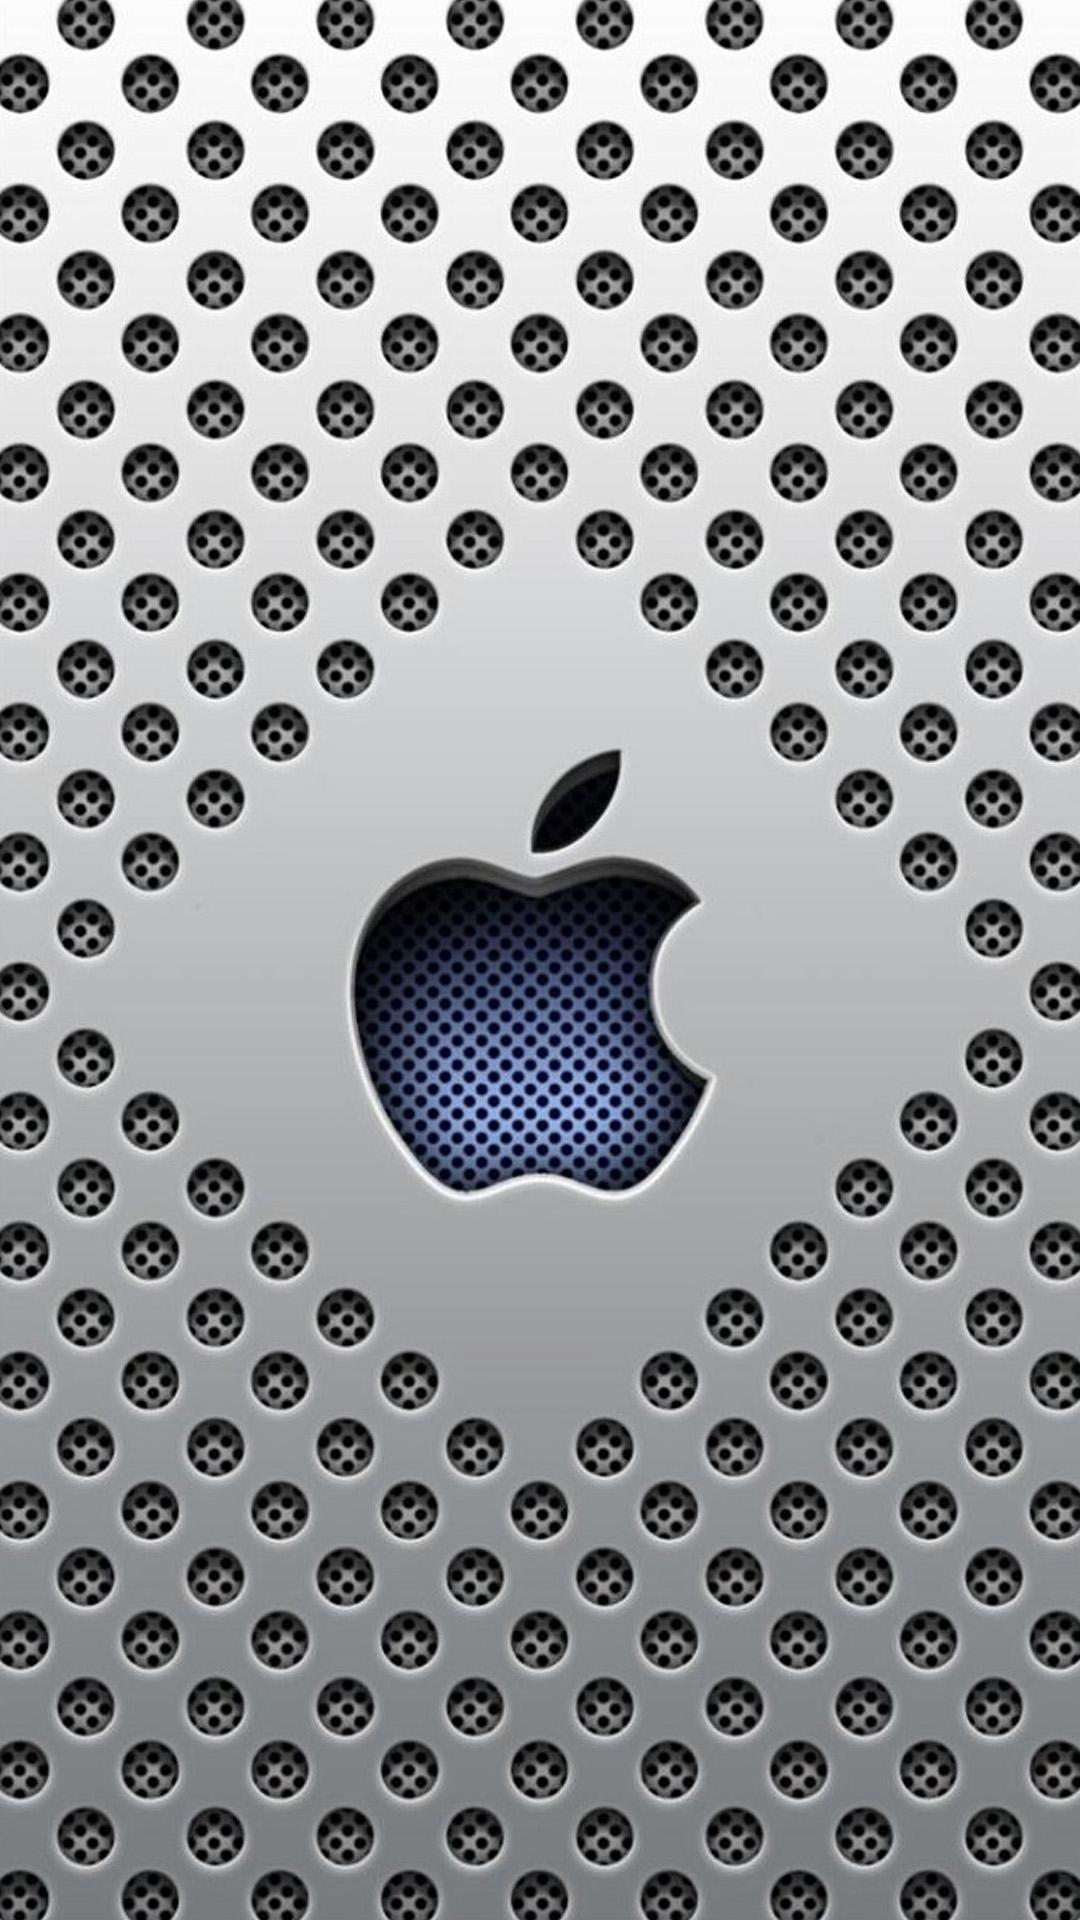 Cool Live Wallpapers For Iphone X Apple Iphone Wallpapers Pixelstalk Net